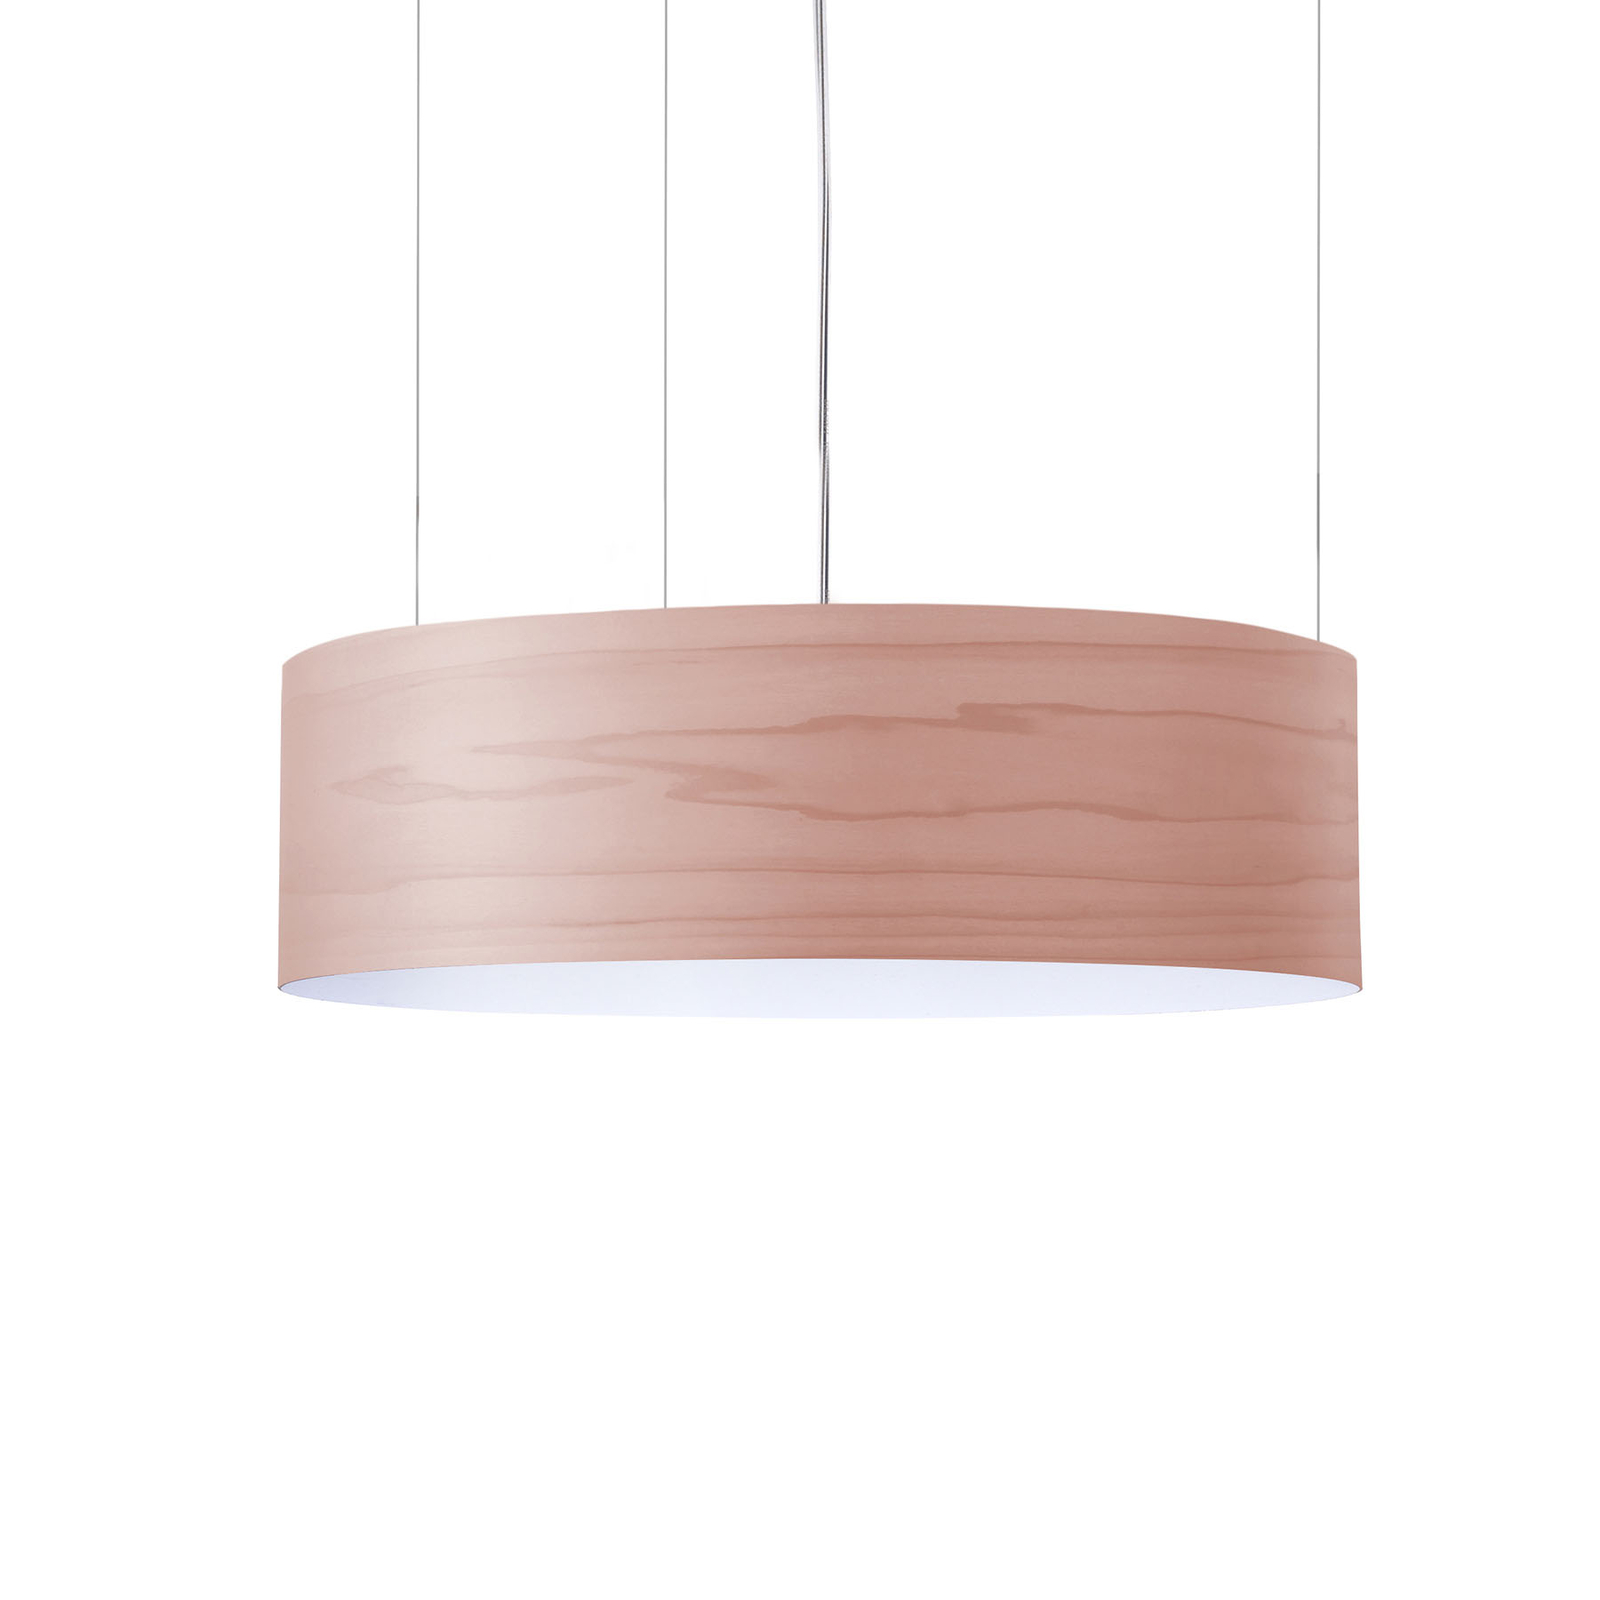 LZF Gea Slim -LED-riippuvalaisin 0–10 V, roosa